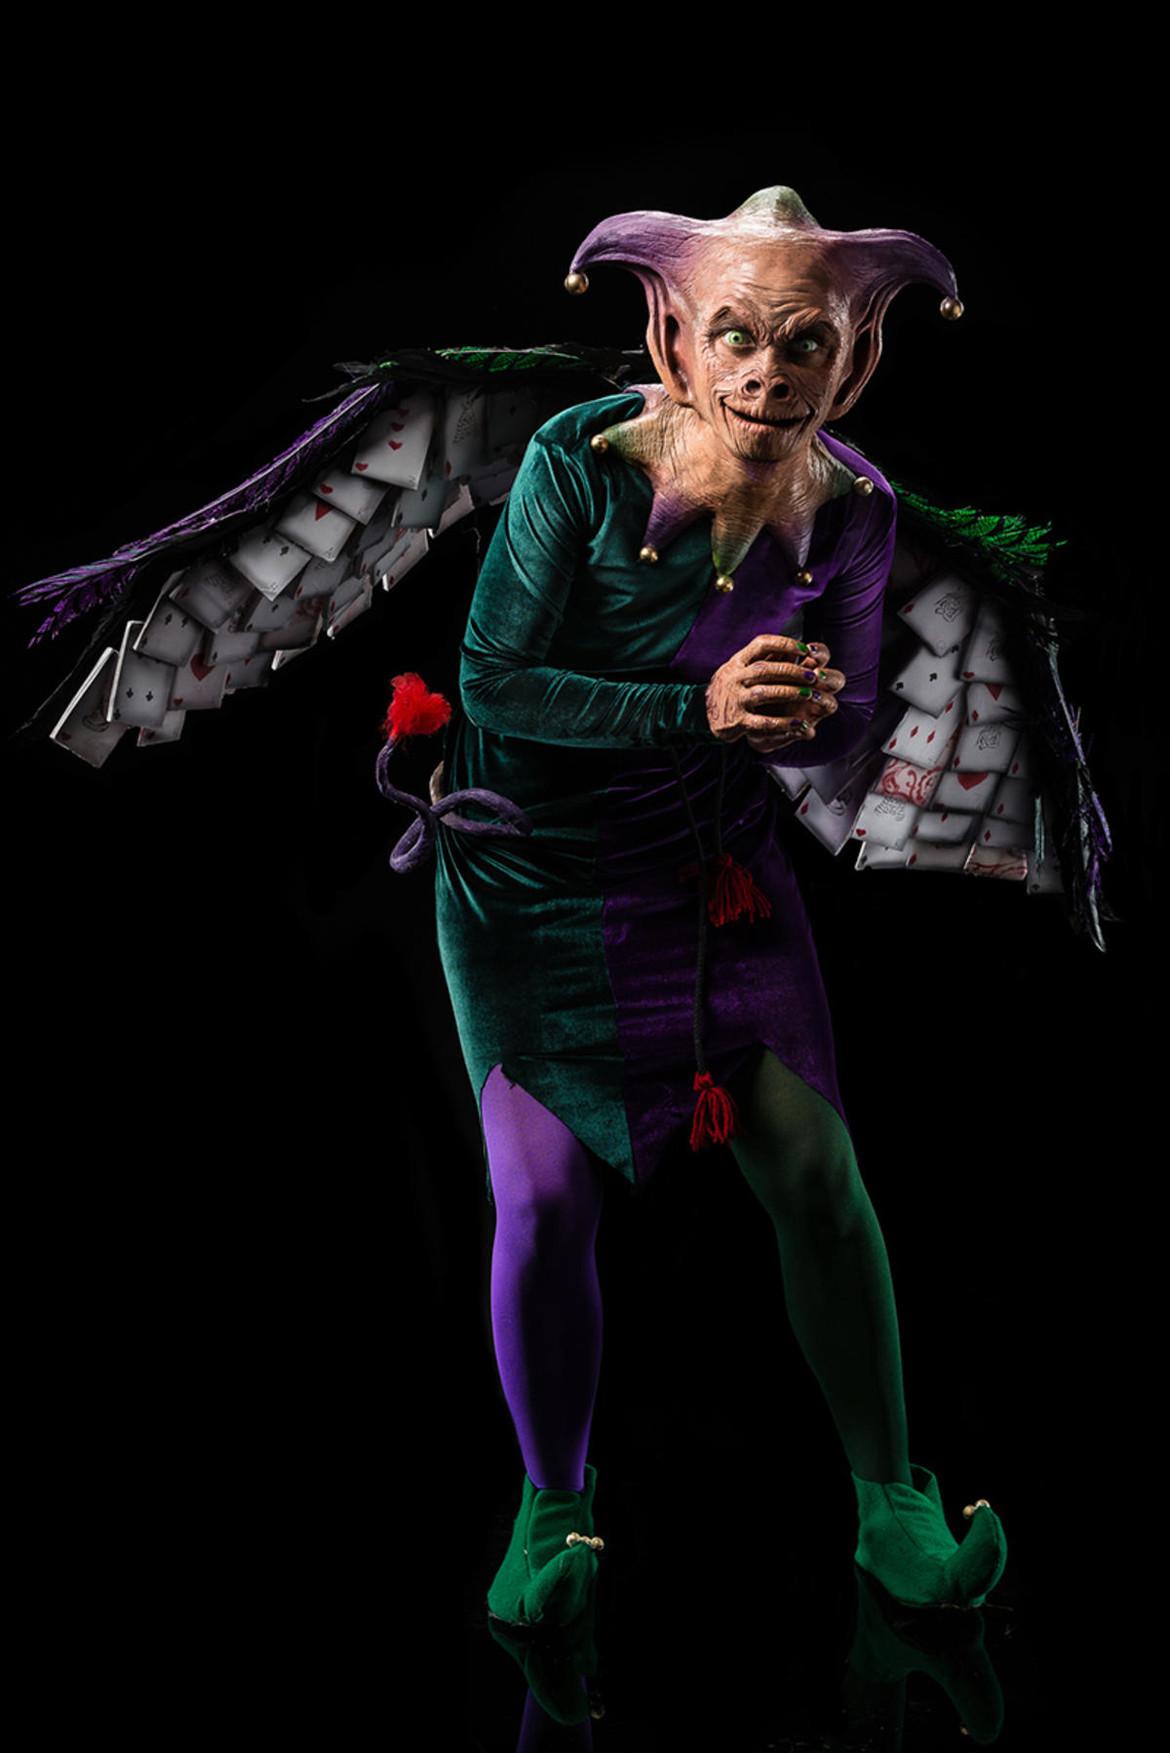 season7-episode6-wizard-of-wonderland-dina-stella-flying-monkey.jpg